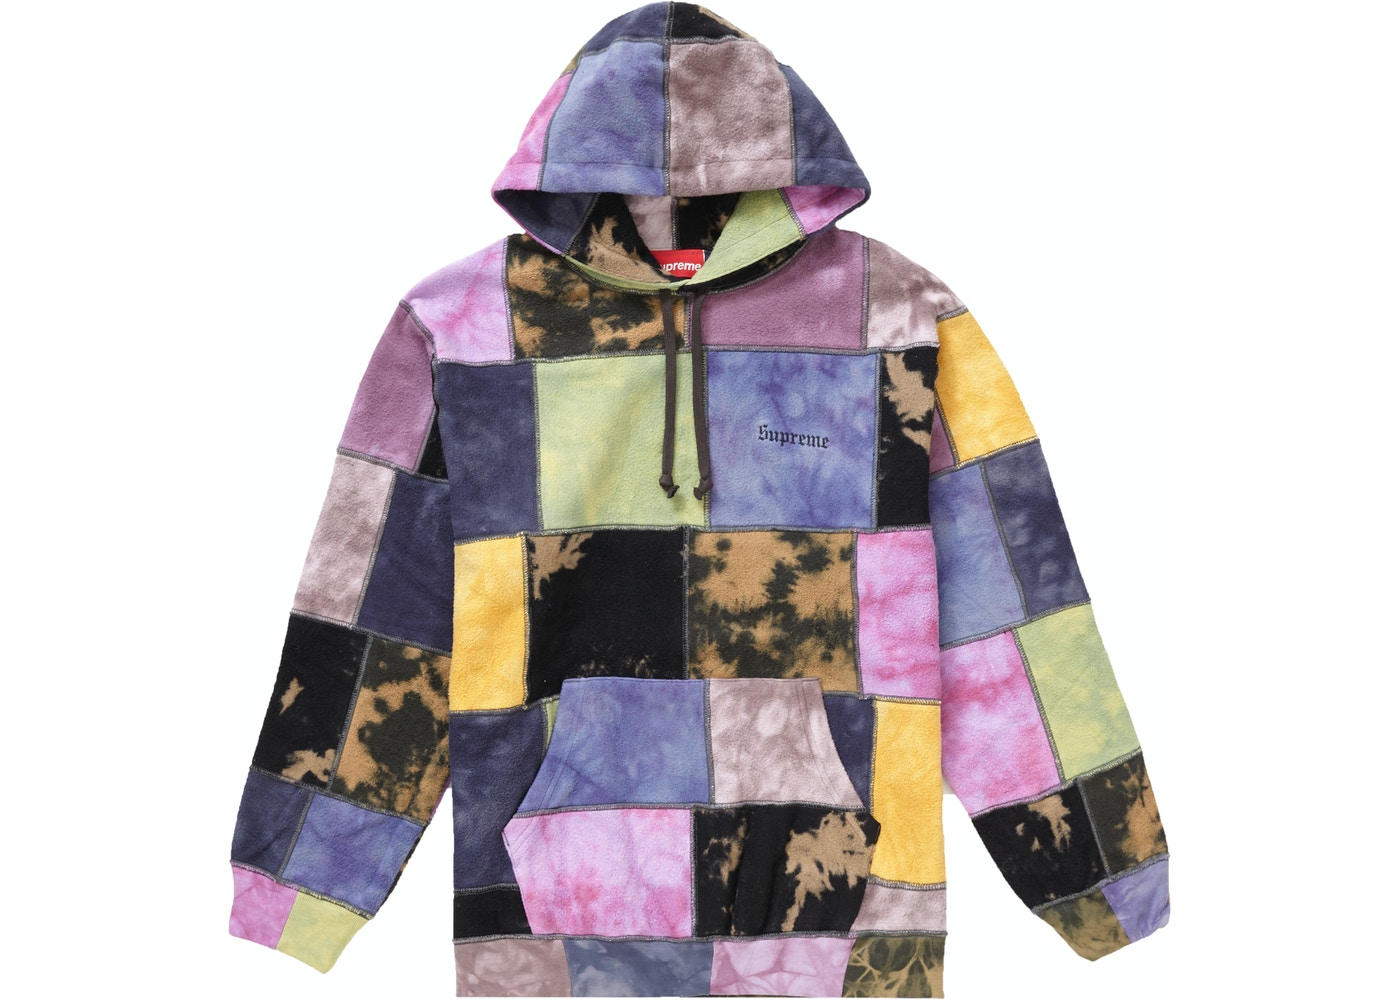 9673c783 Supreme Patchwork Tie Dye Hooded Sweatshirt Tie Dye - SS19